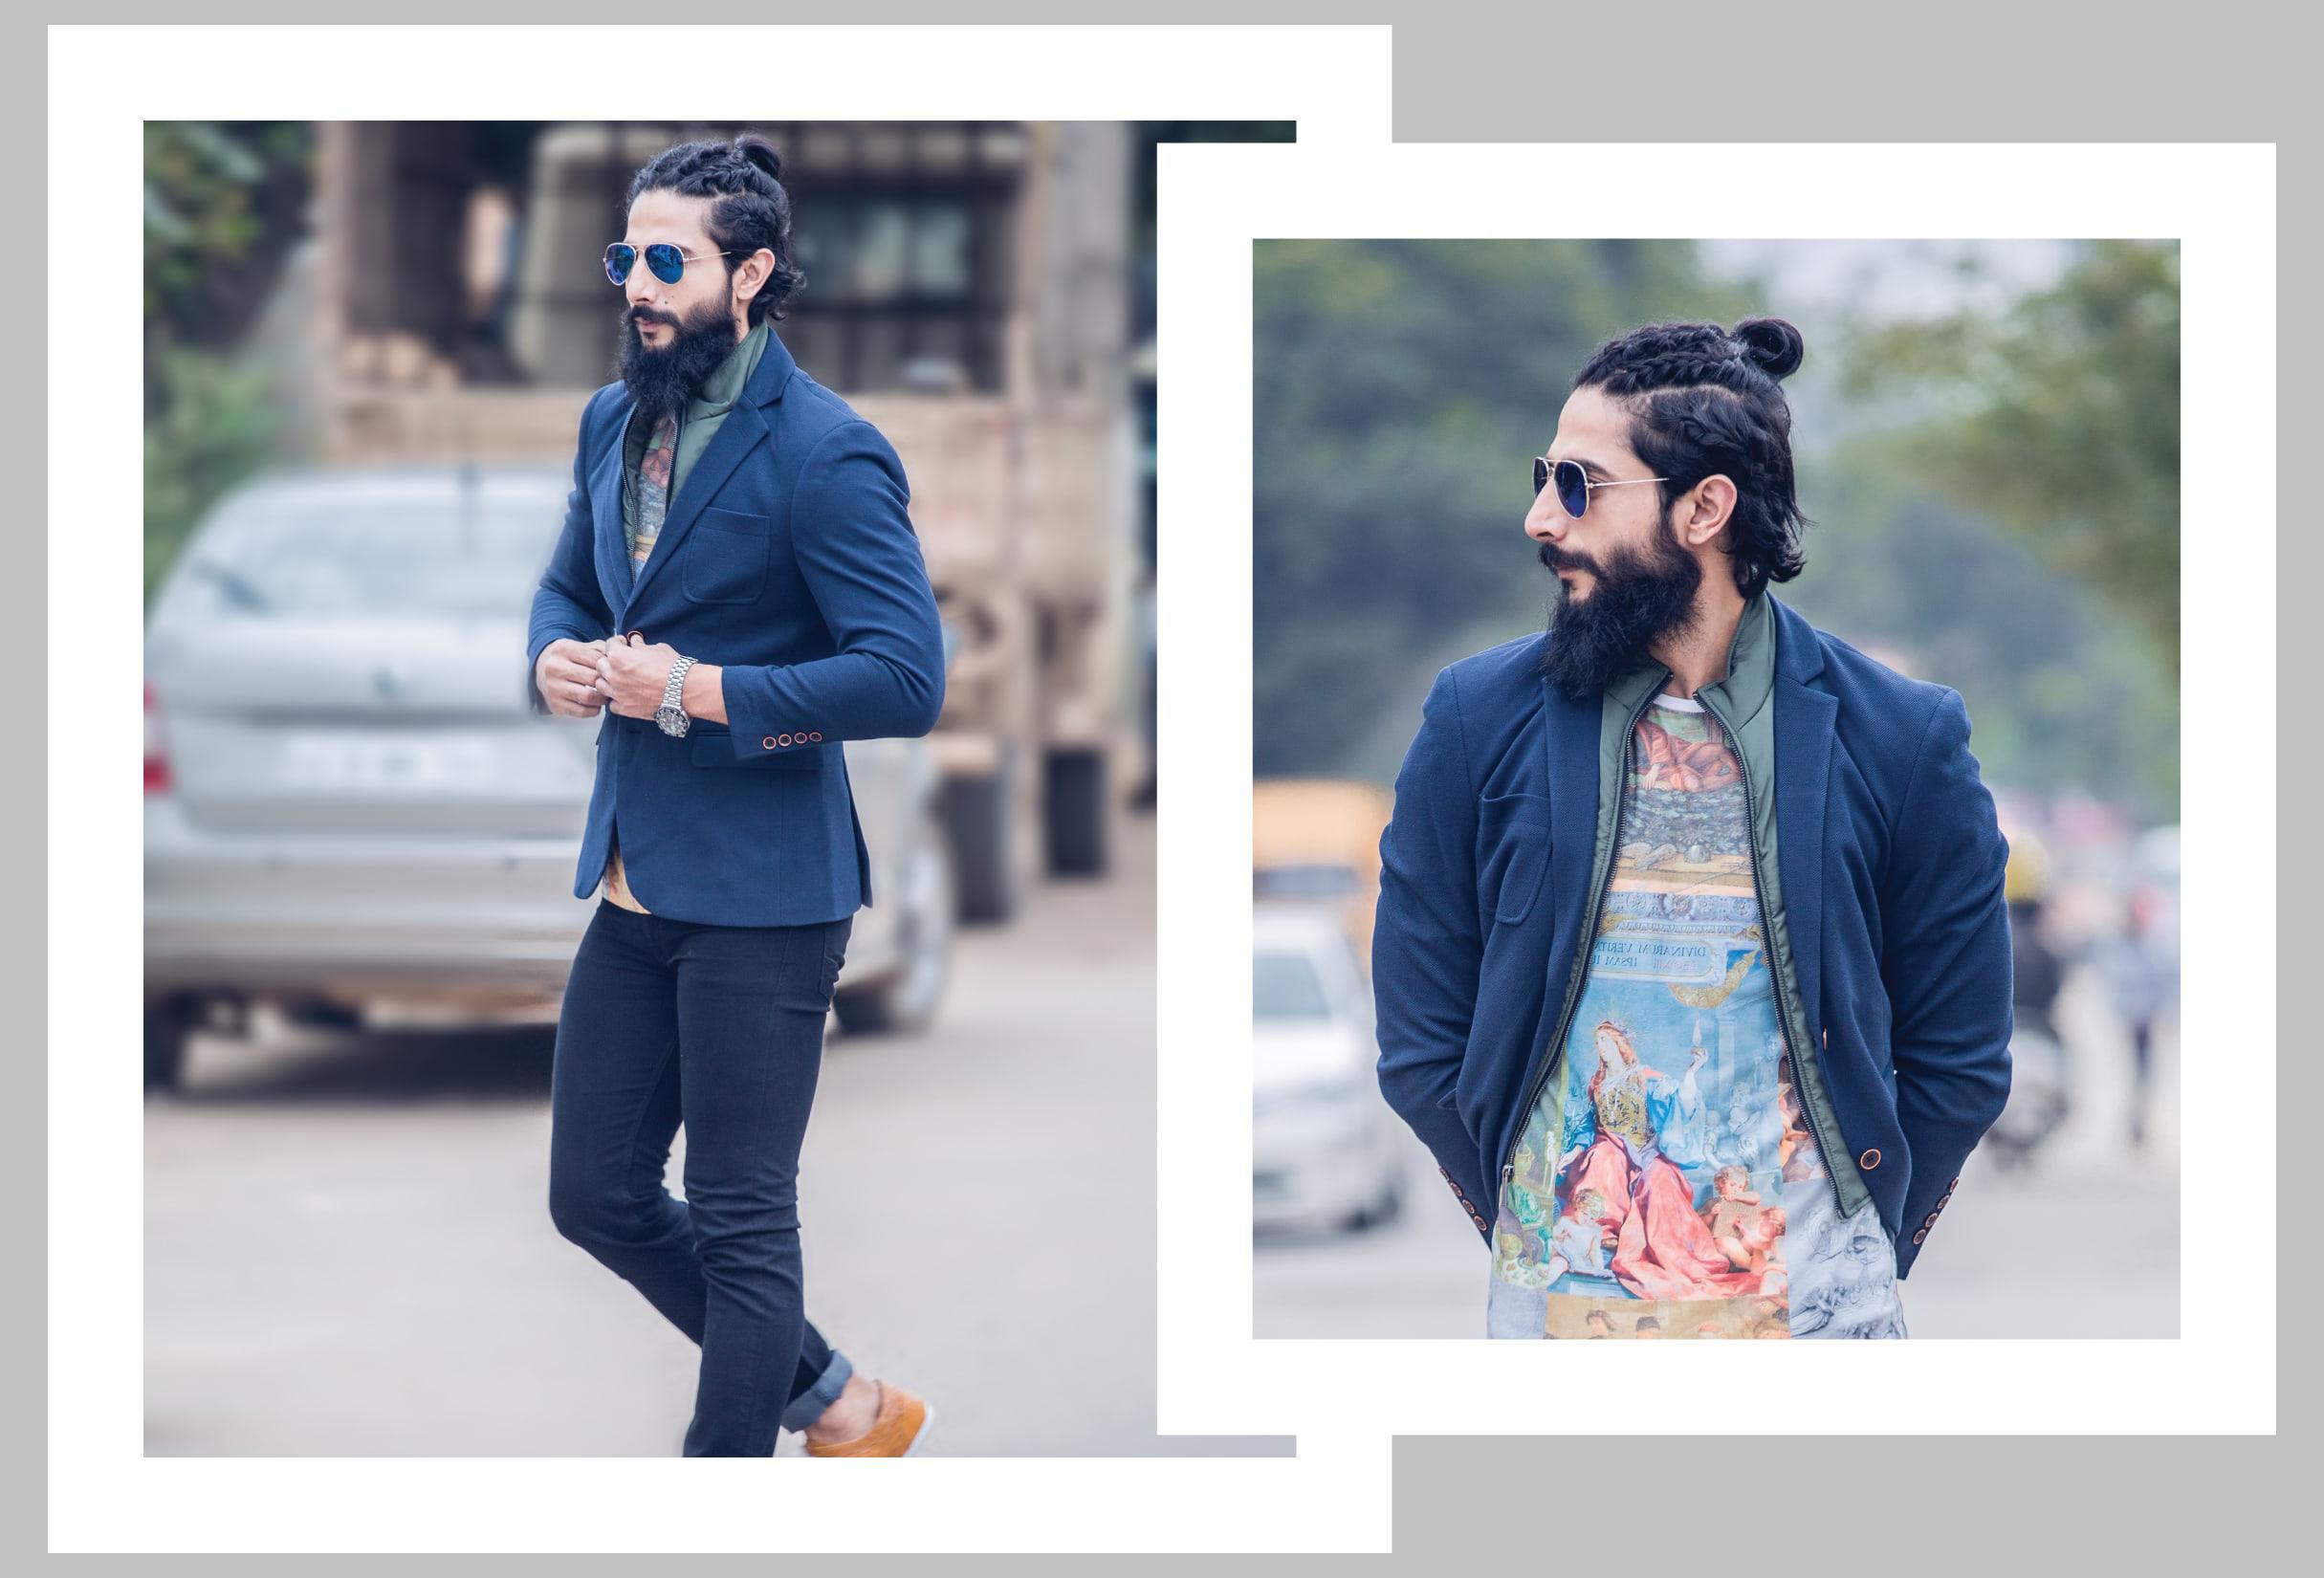 Kamaljeet_Rana_Layered_Jacket_Graphic_Tshirt_Fashion_Style